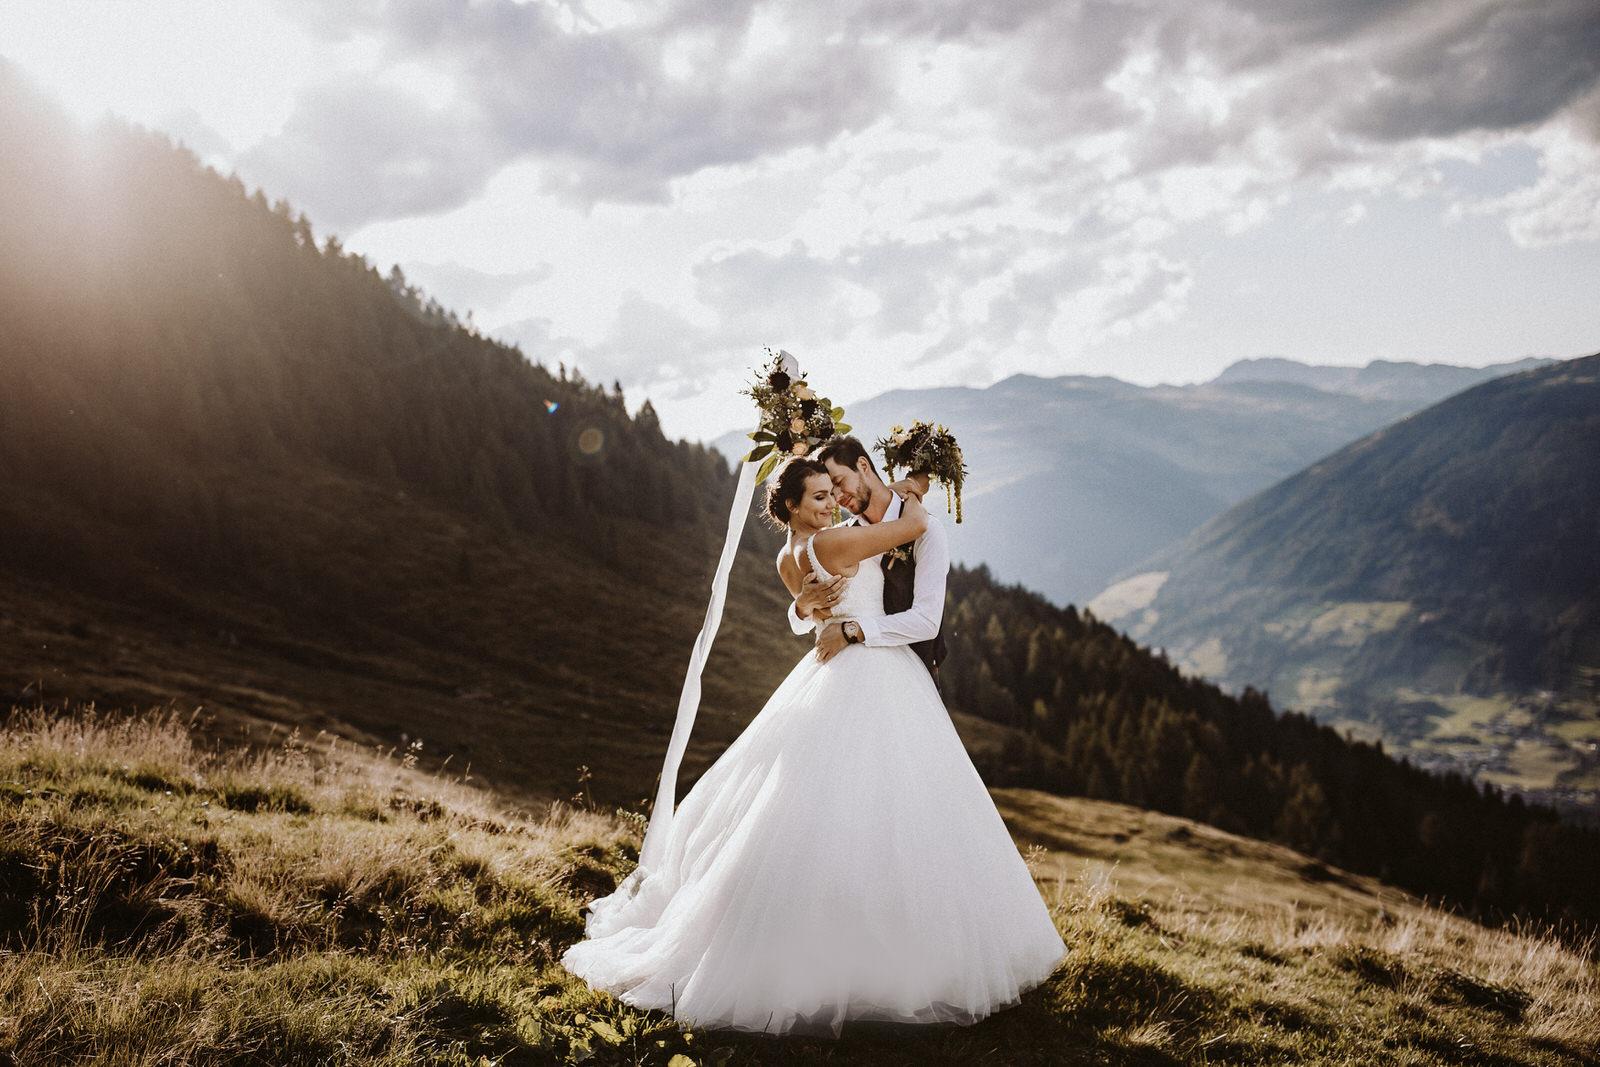 Mountainlove in Austria by Eva Reifmüller